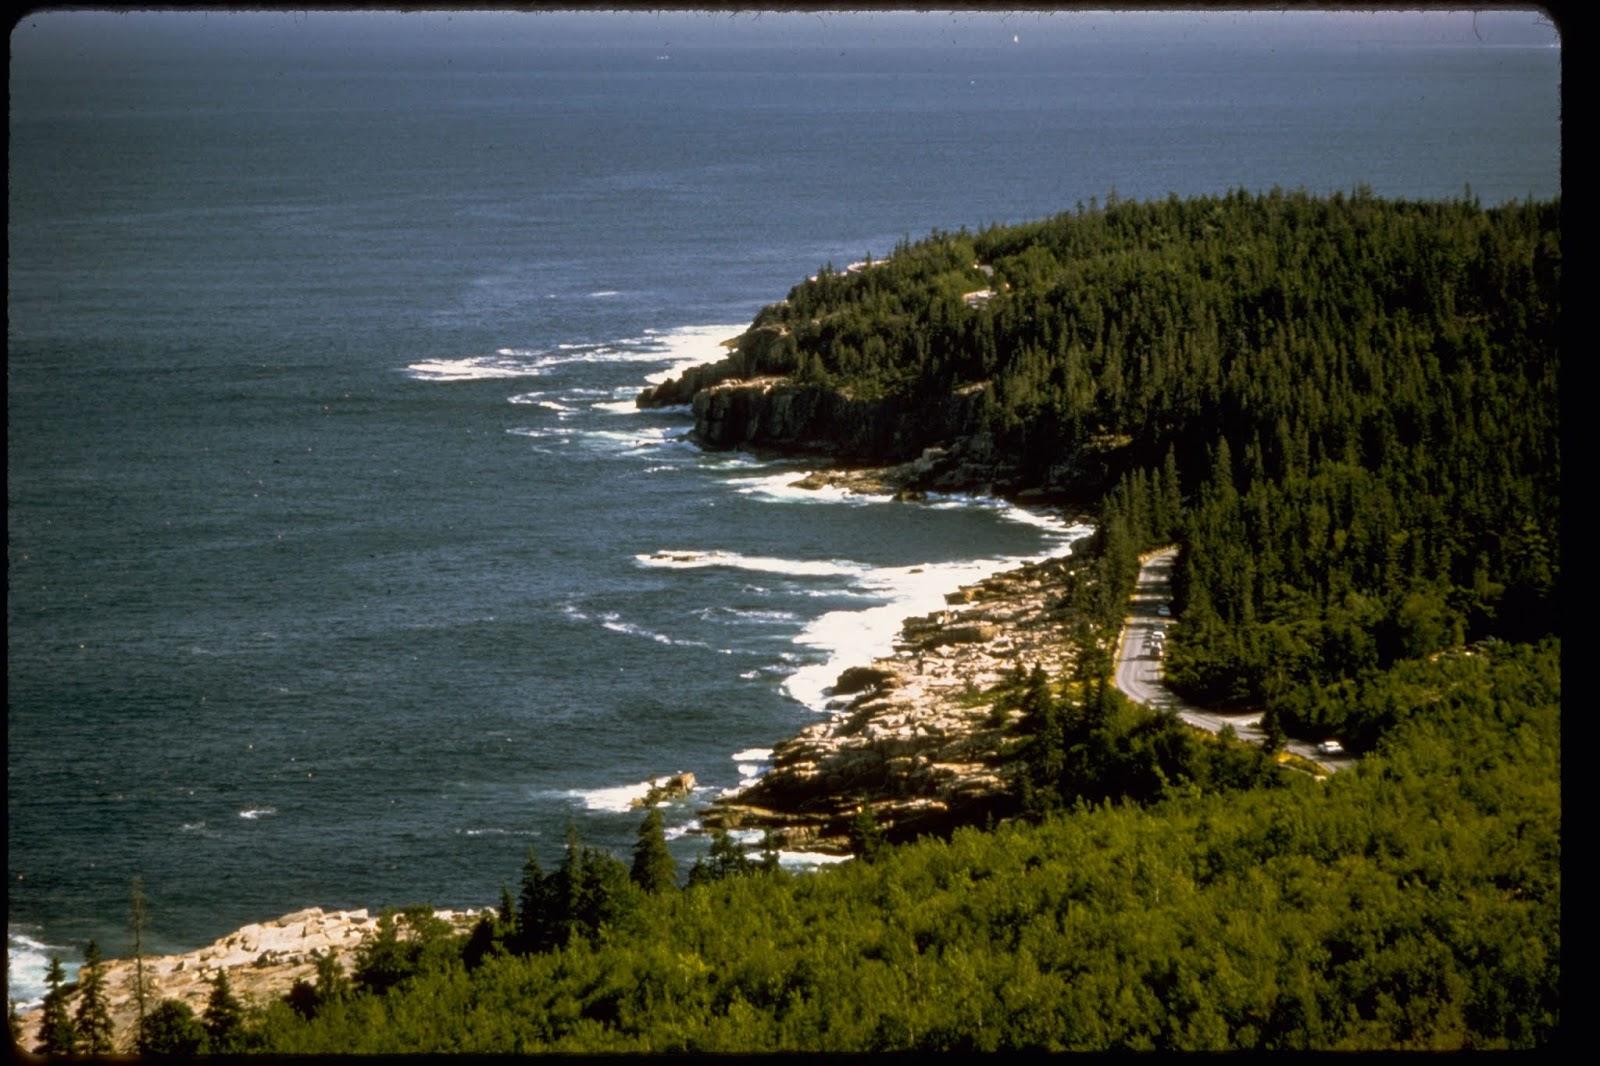 Public domain Windows Desktop wallpapers from US National Parks photos